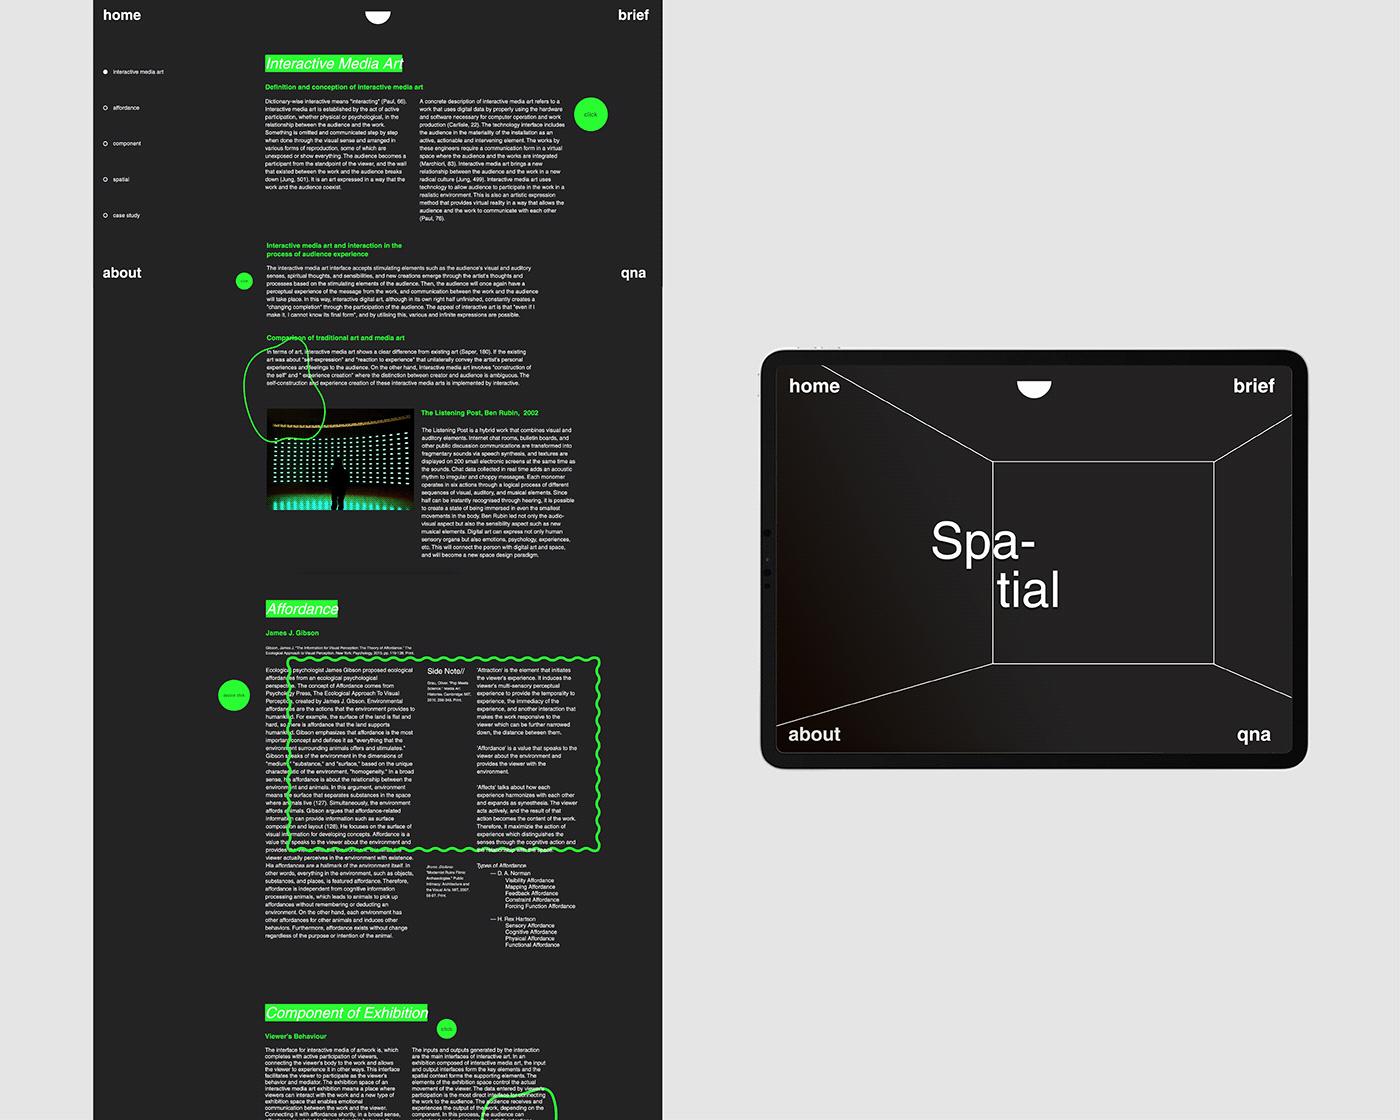 communication interaction interactive interactive media art Responsive spatial UI UI/UX ux Website Design